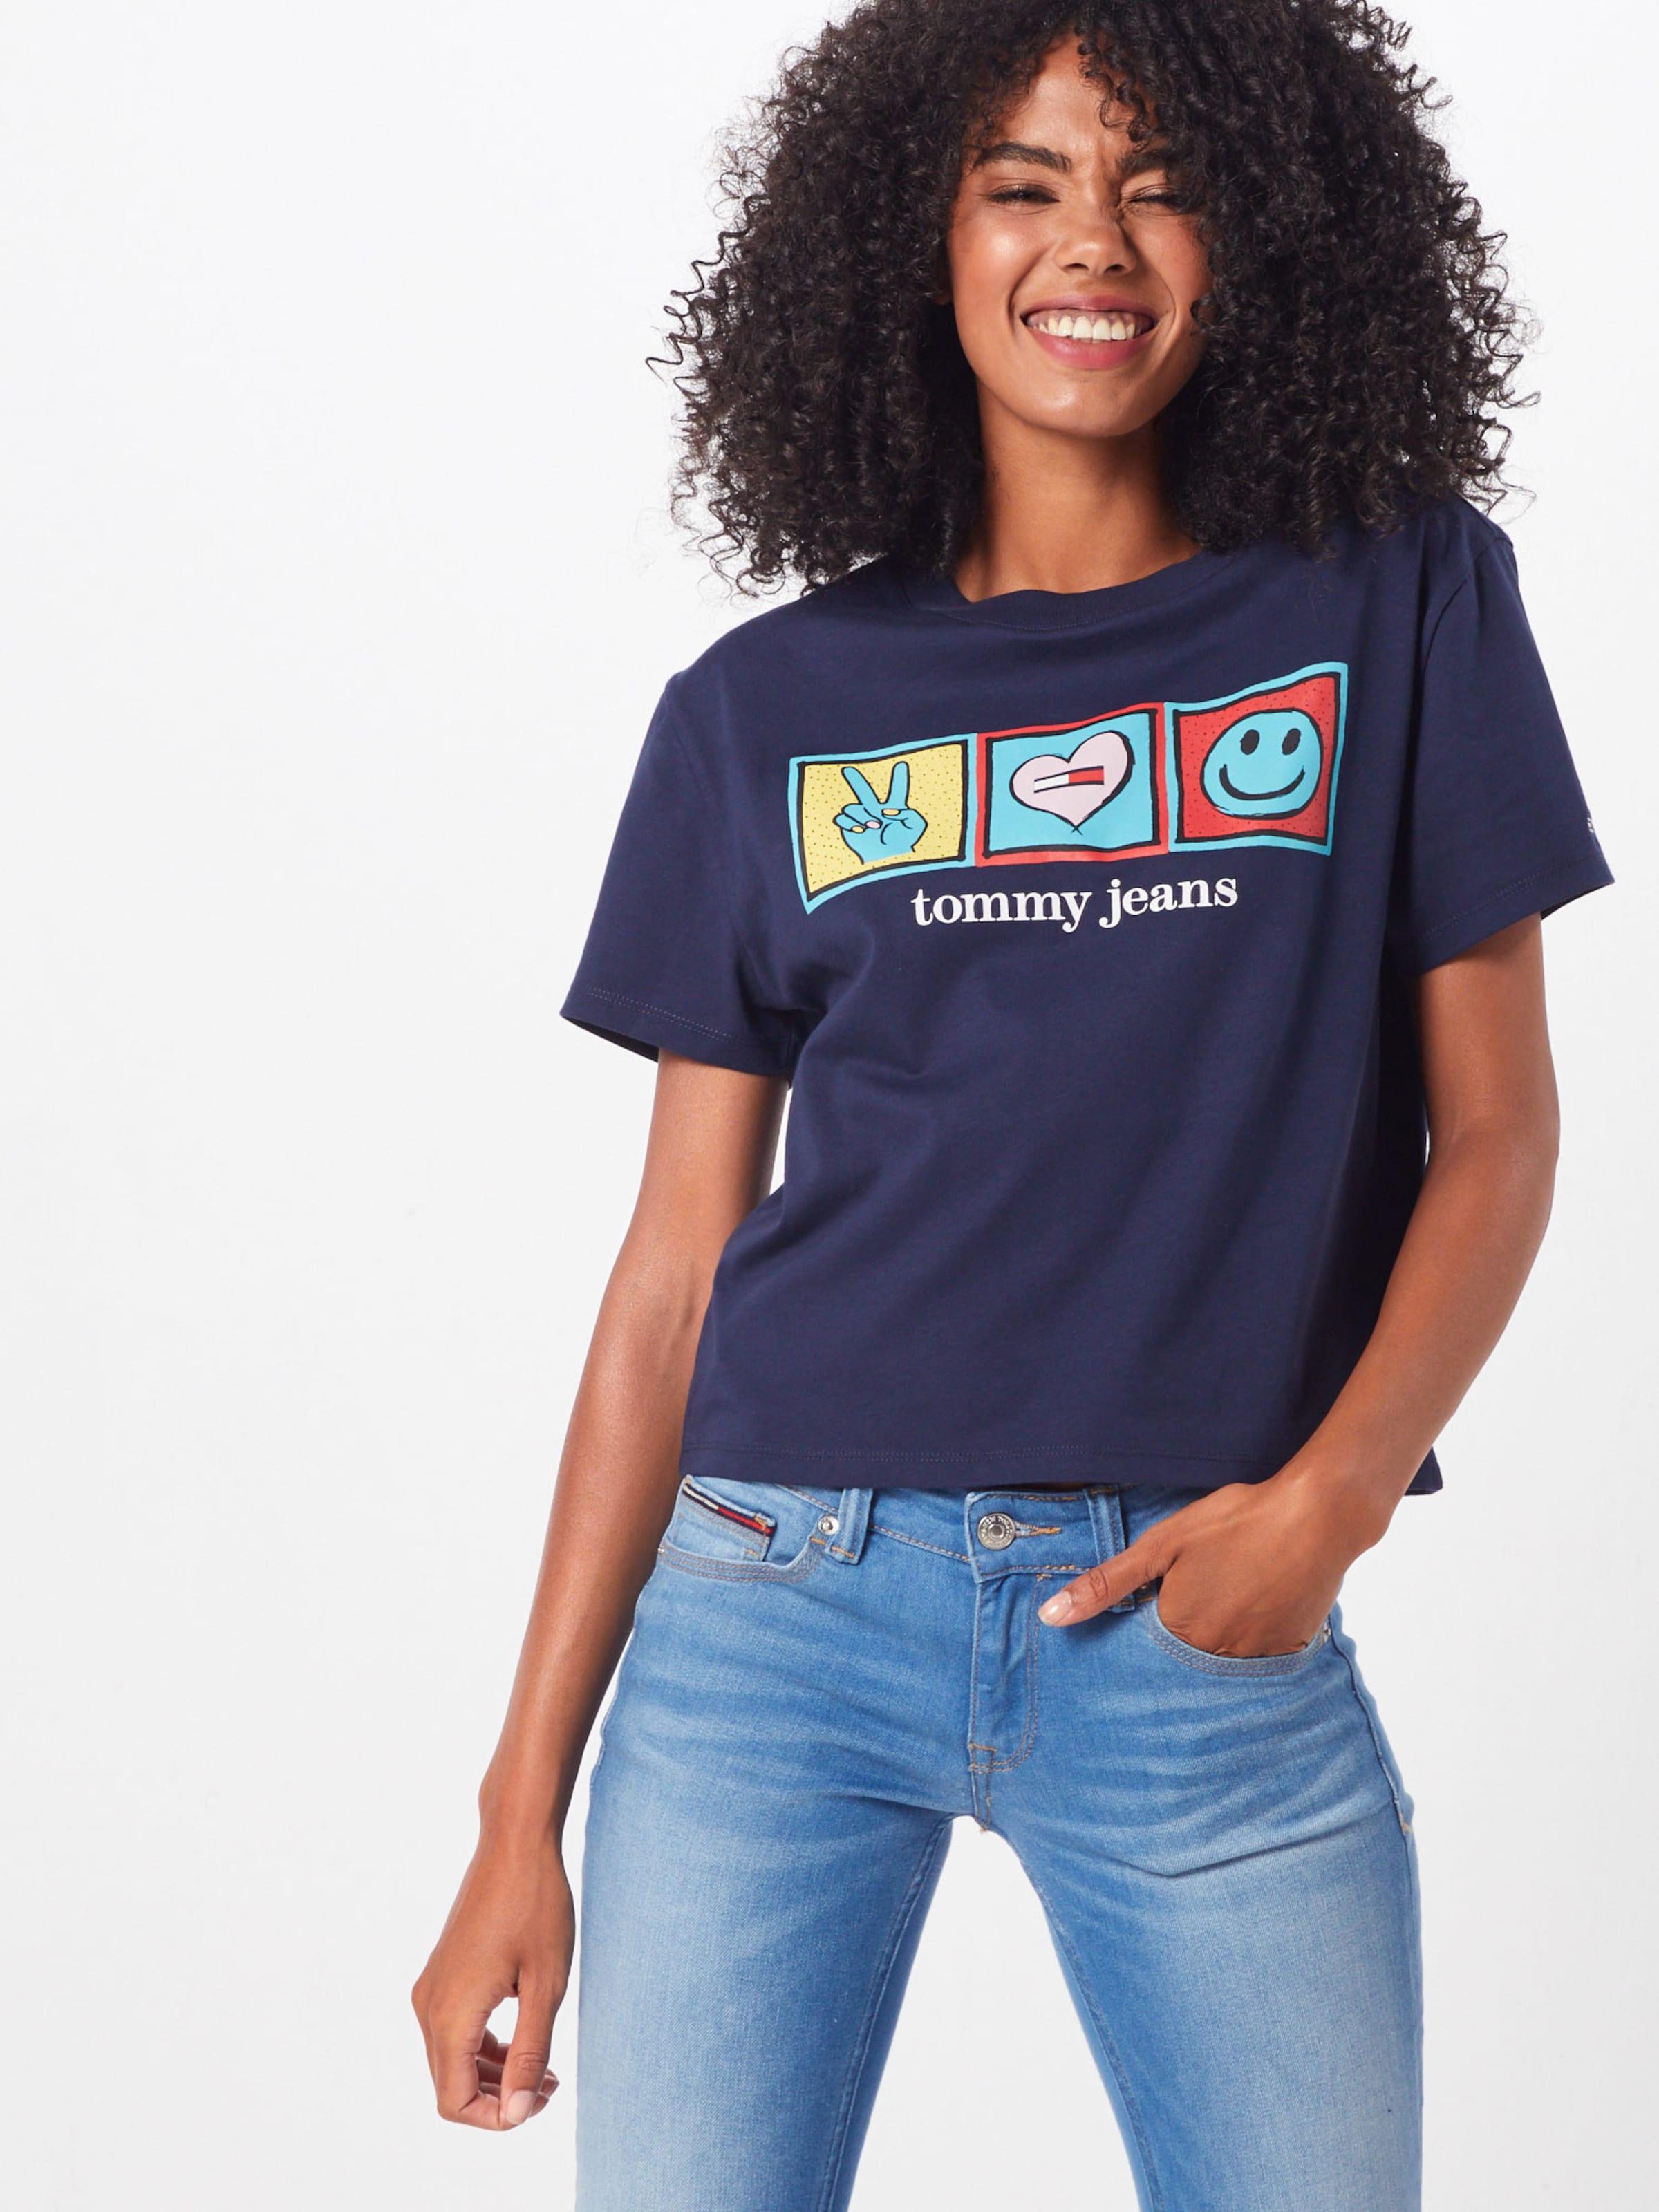 Tommy NavyMischfarben Positive T shirt In Jeans 'tjw Tee' TlK15uFJc3